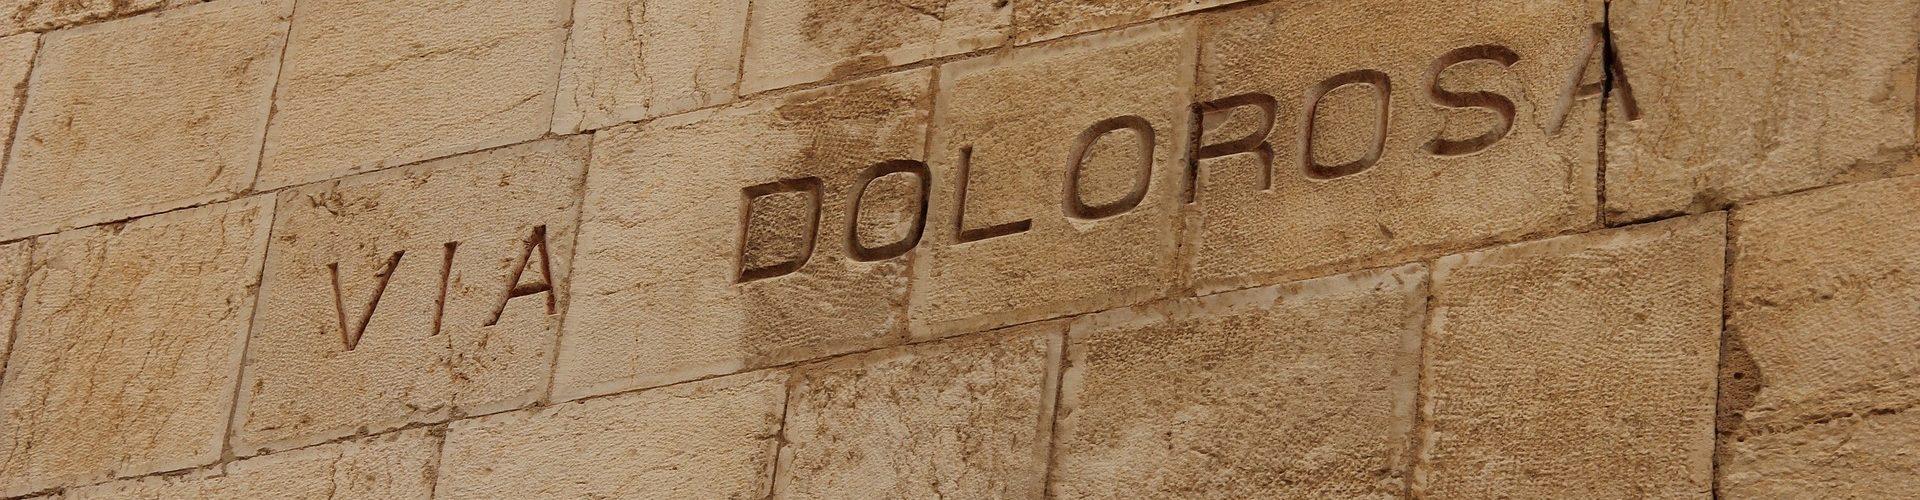 Via Dolorosa skrivet på en mur